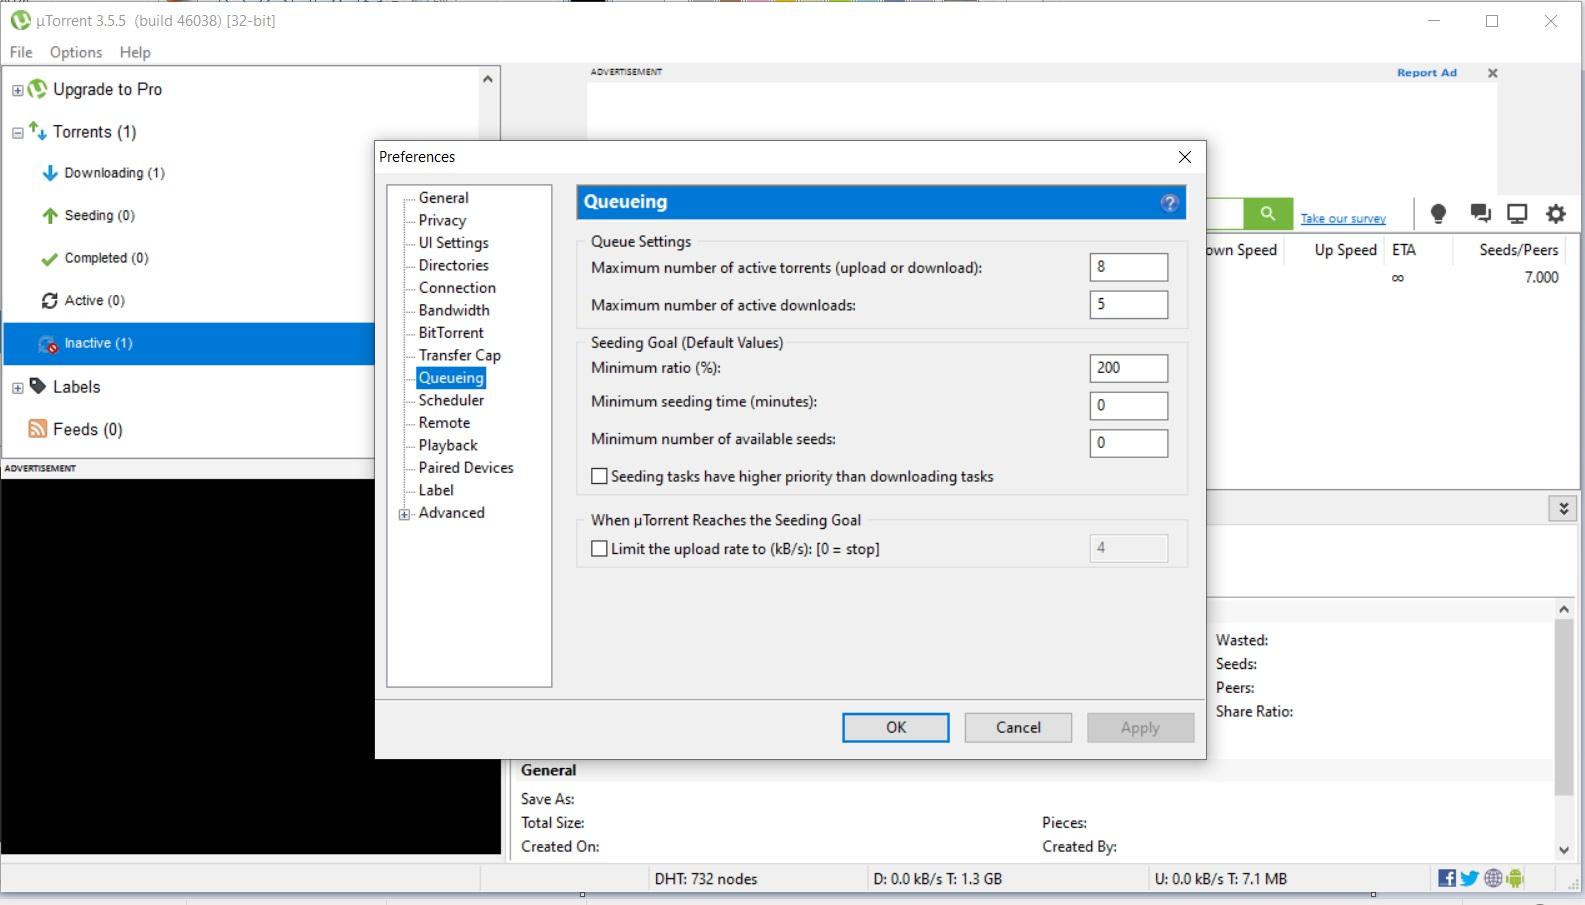 uTorrent Options Tab Preferences Queueing